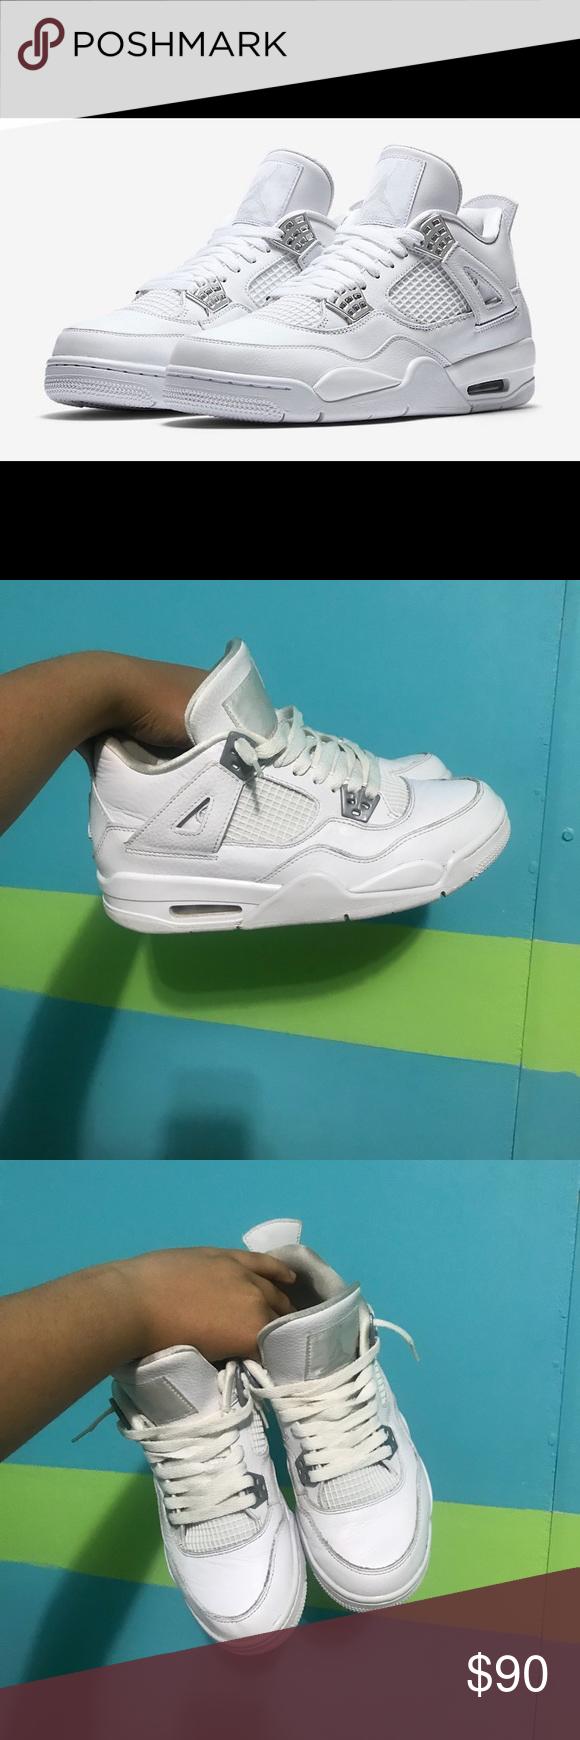 online store 13102 a6e74 All White 4s Jordan's white and gray size 7 Jordan Shoes ...